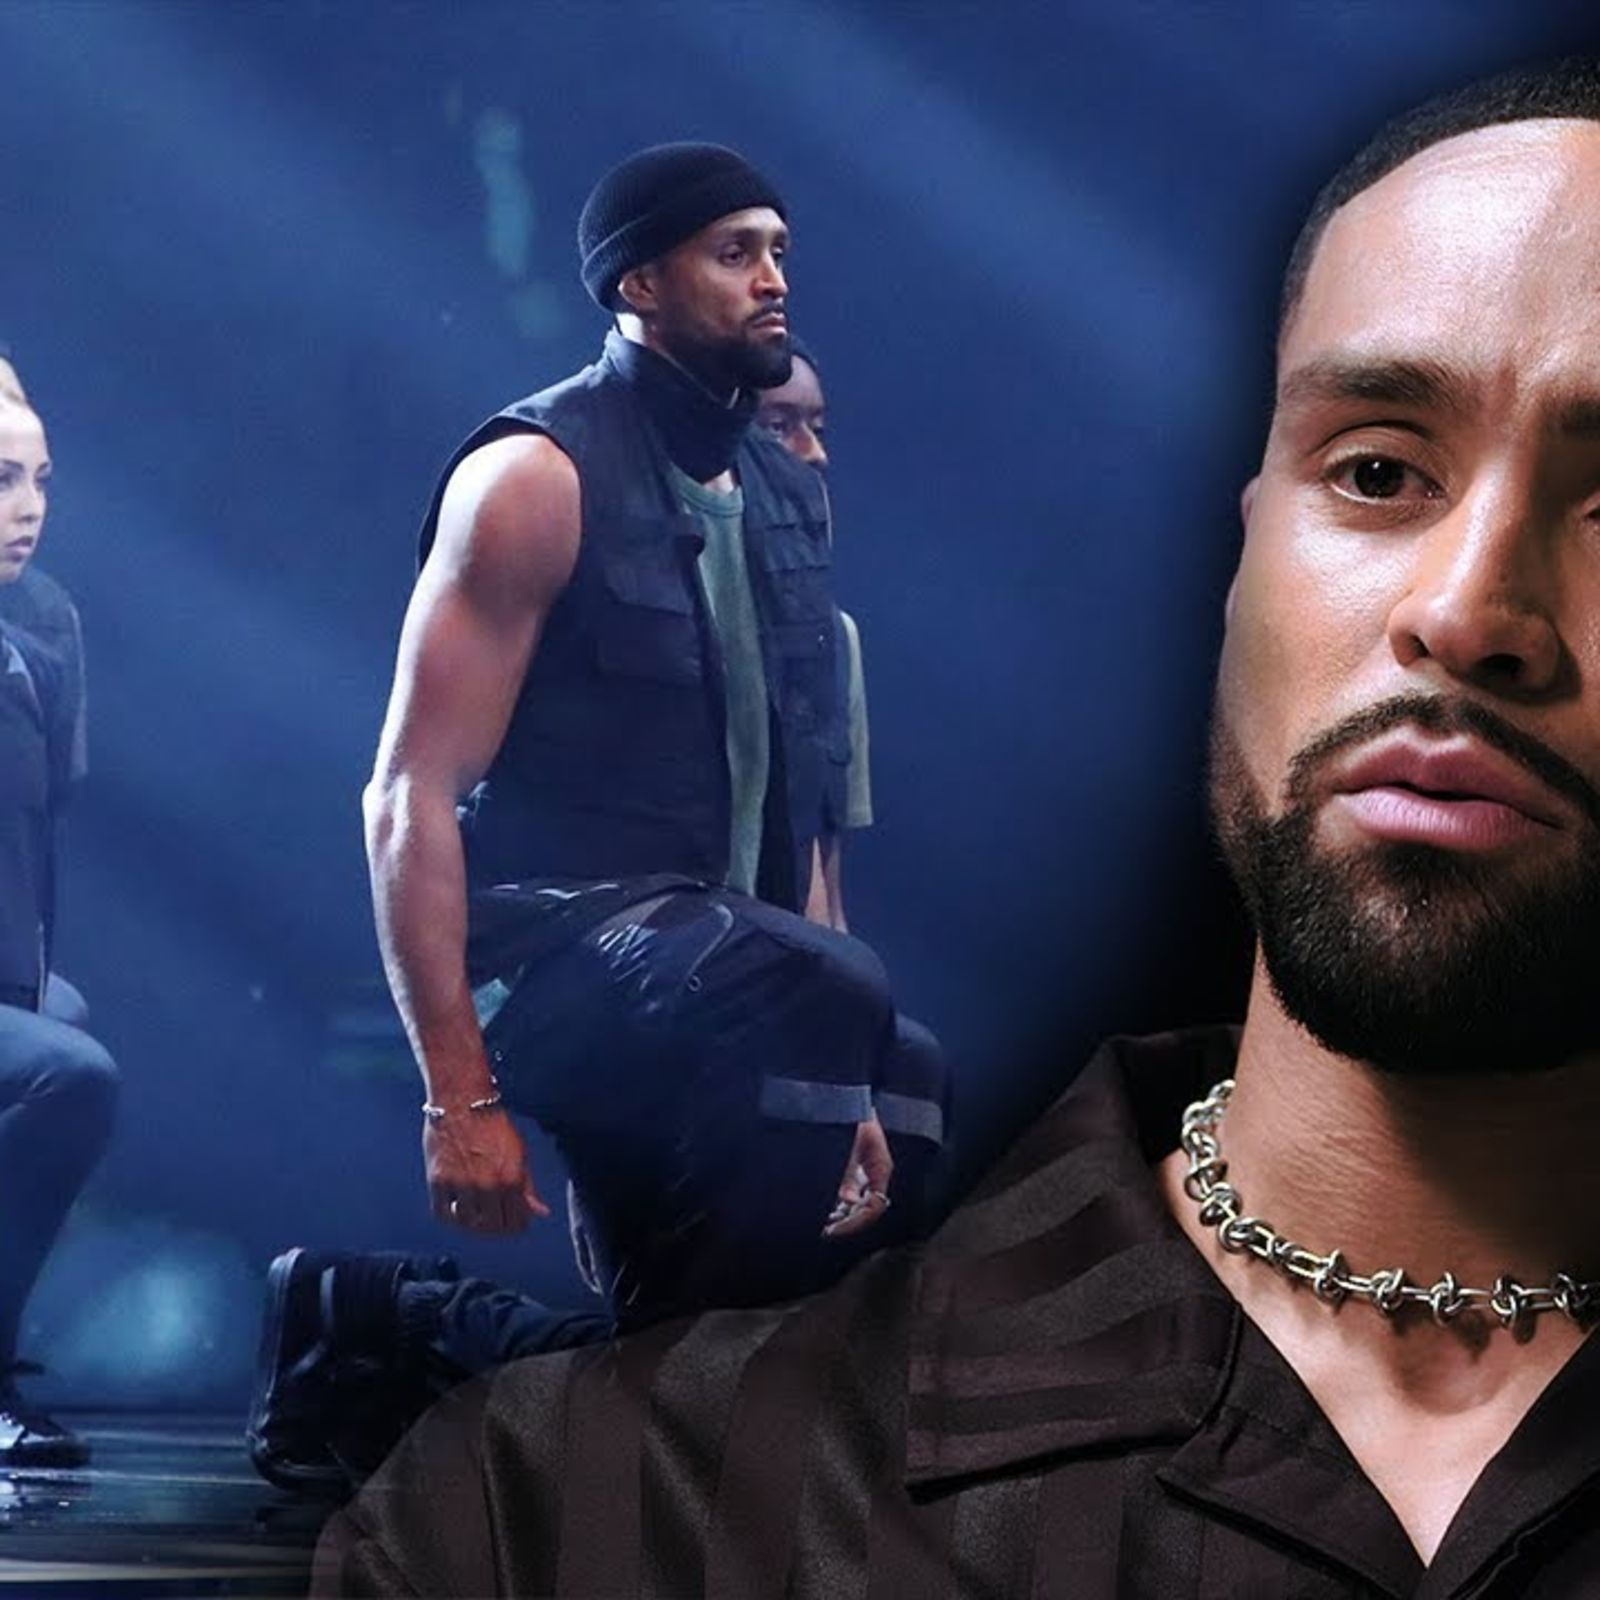 Ashley Banjo on TV's most talked about moment: Diversity's BGT 2020 performance